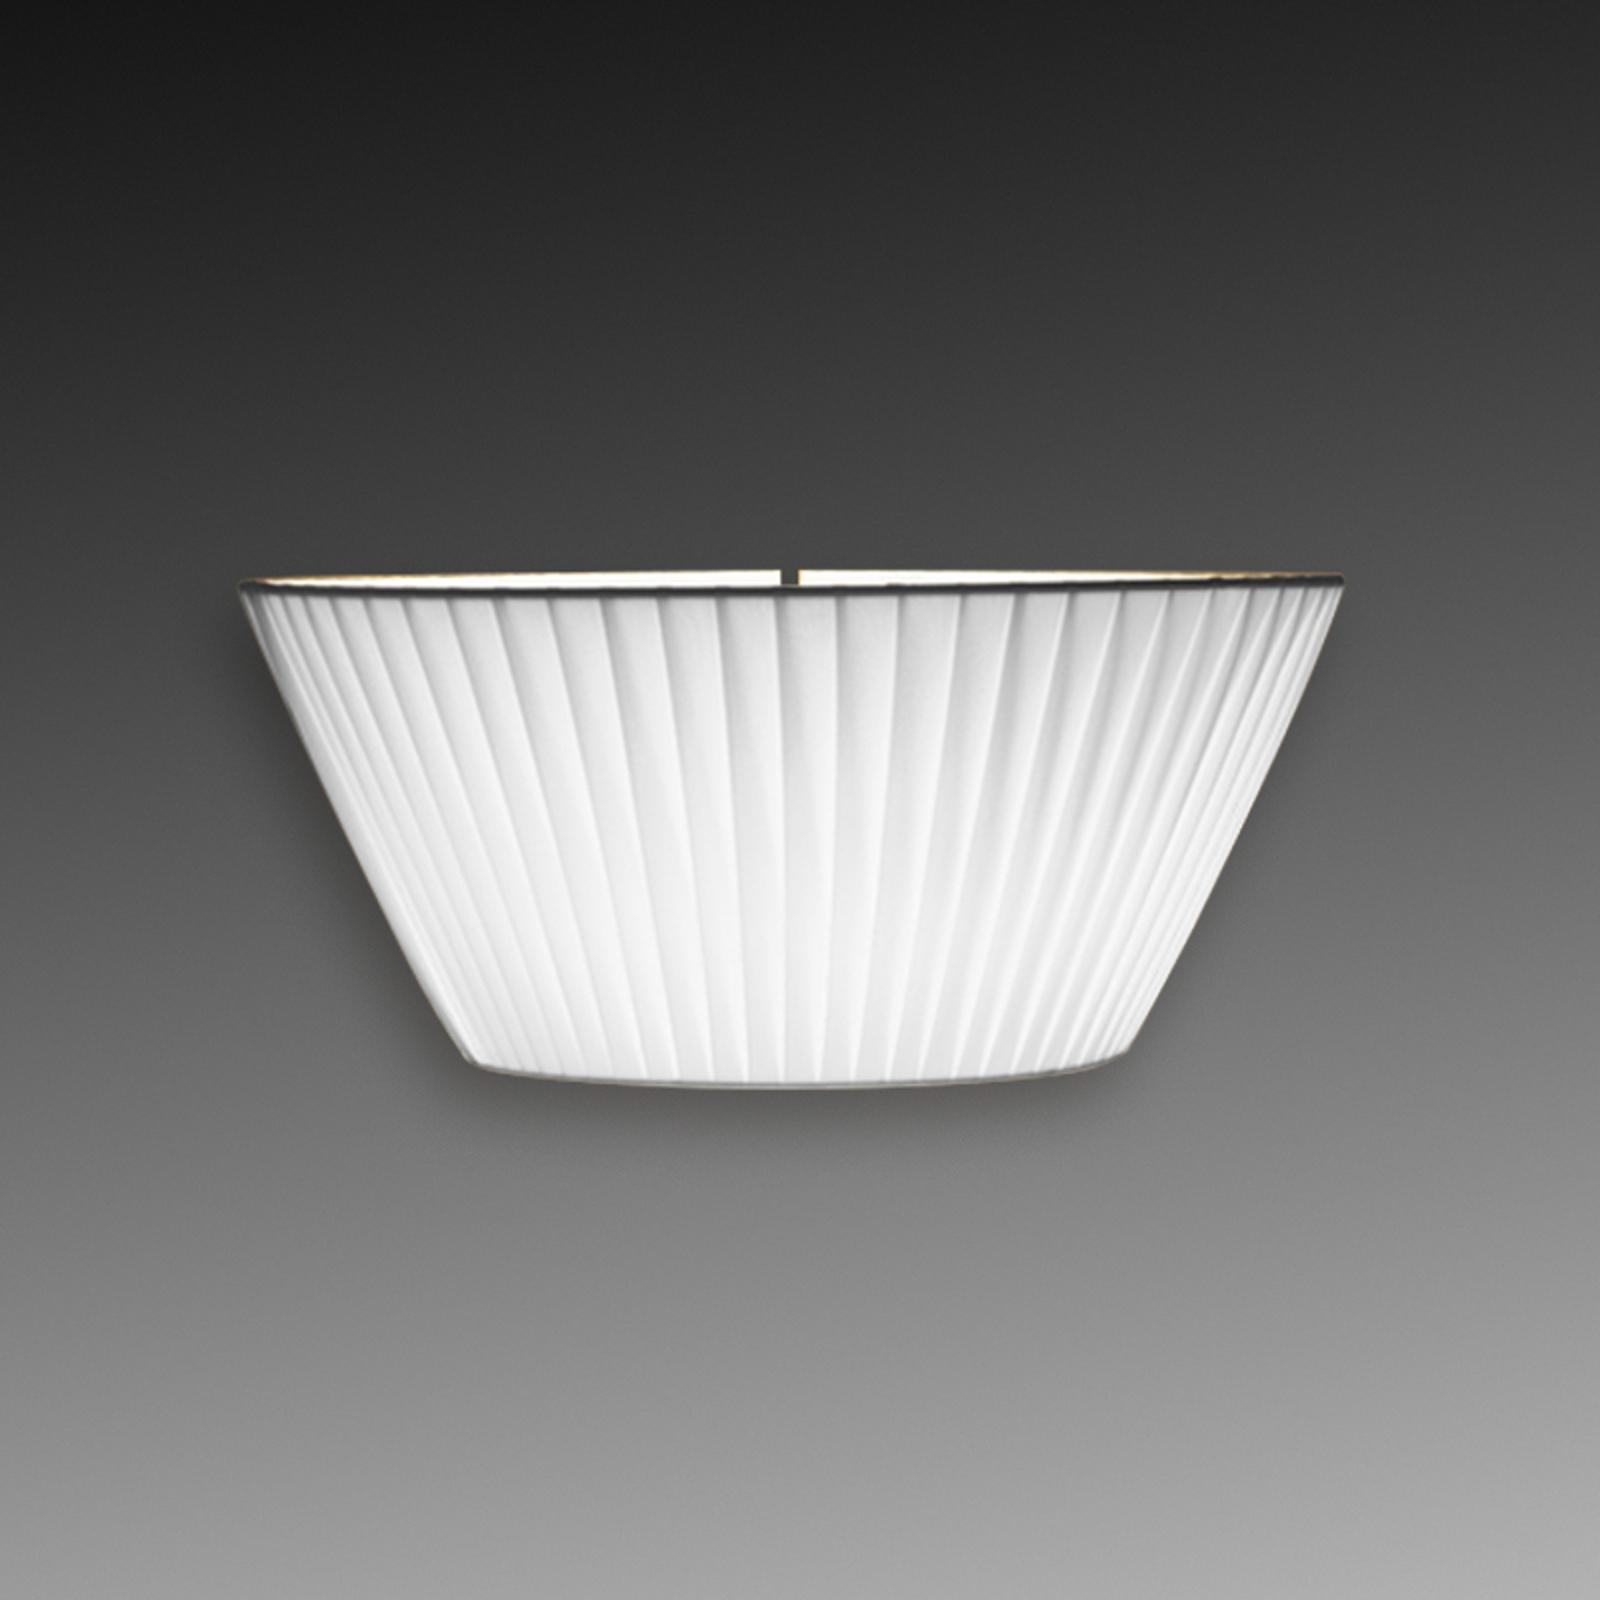 Opvallende wandlamp Emma, 30 cm breed, wit